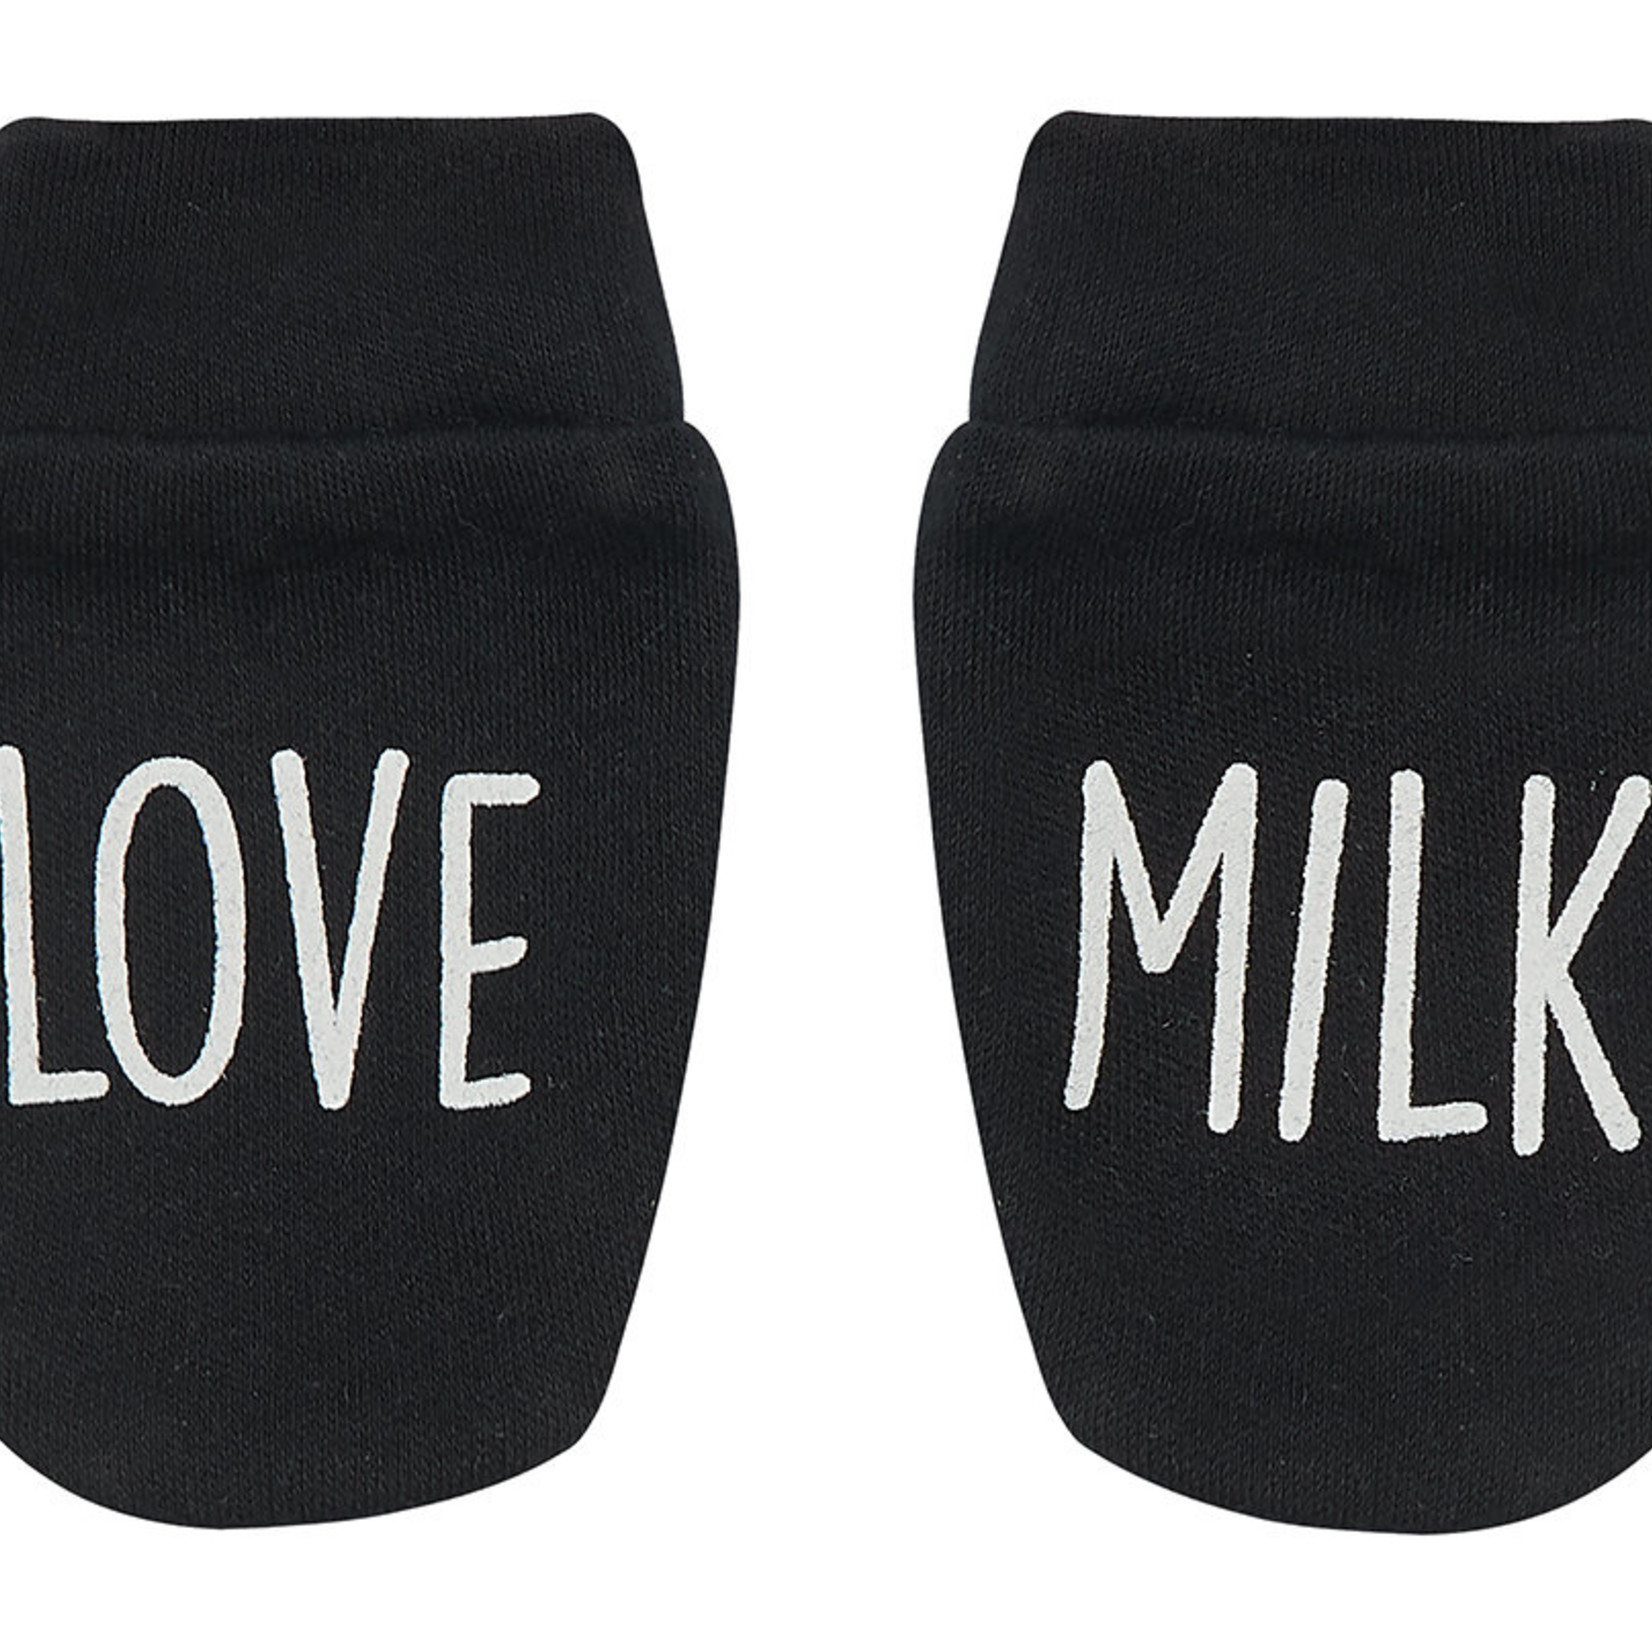 Peacheyboo Peacheyboo Krabwantjes 'Love milk' Zwart